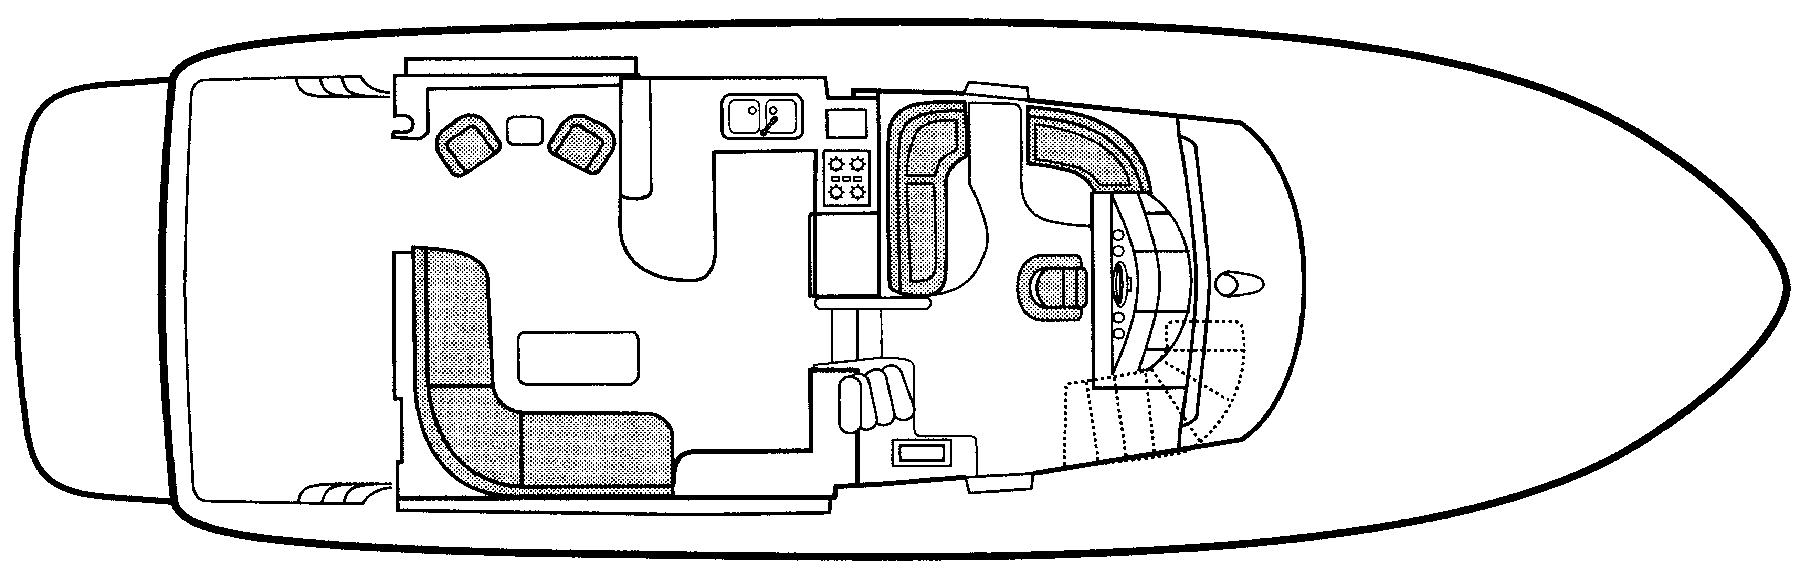 5288 Pilothouse Floor Plan 2